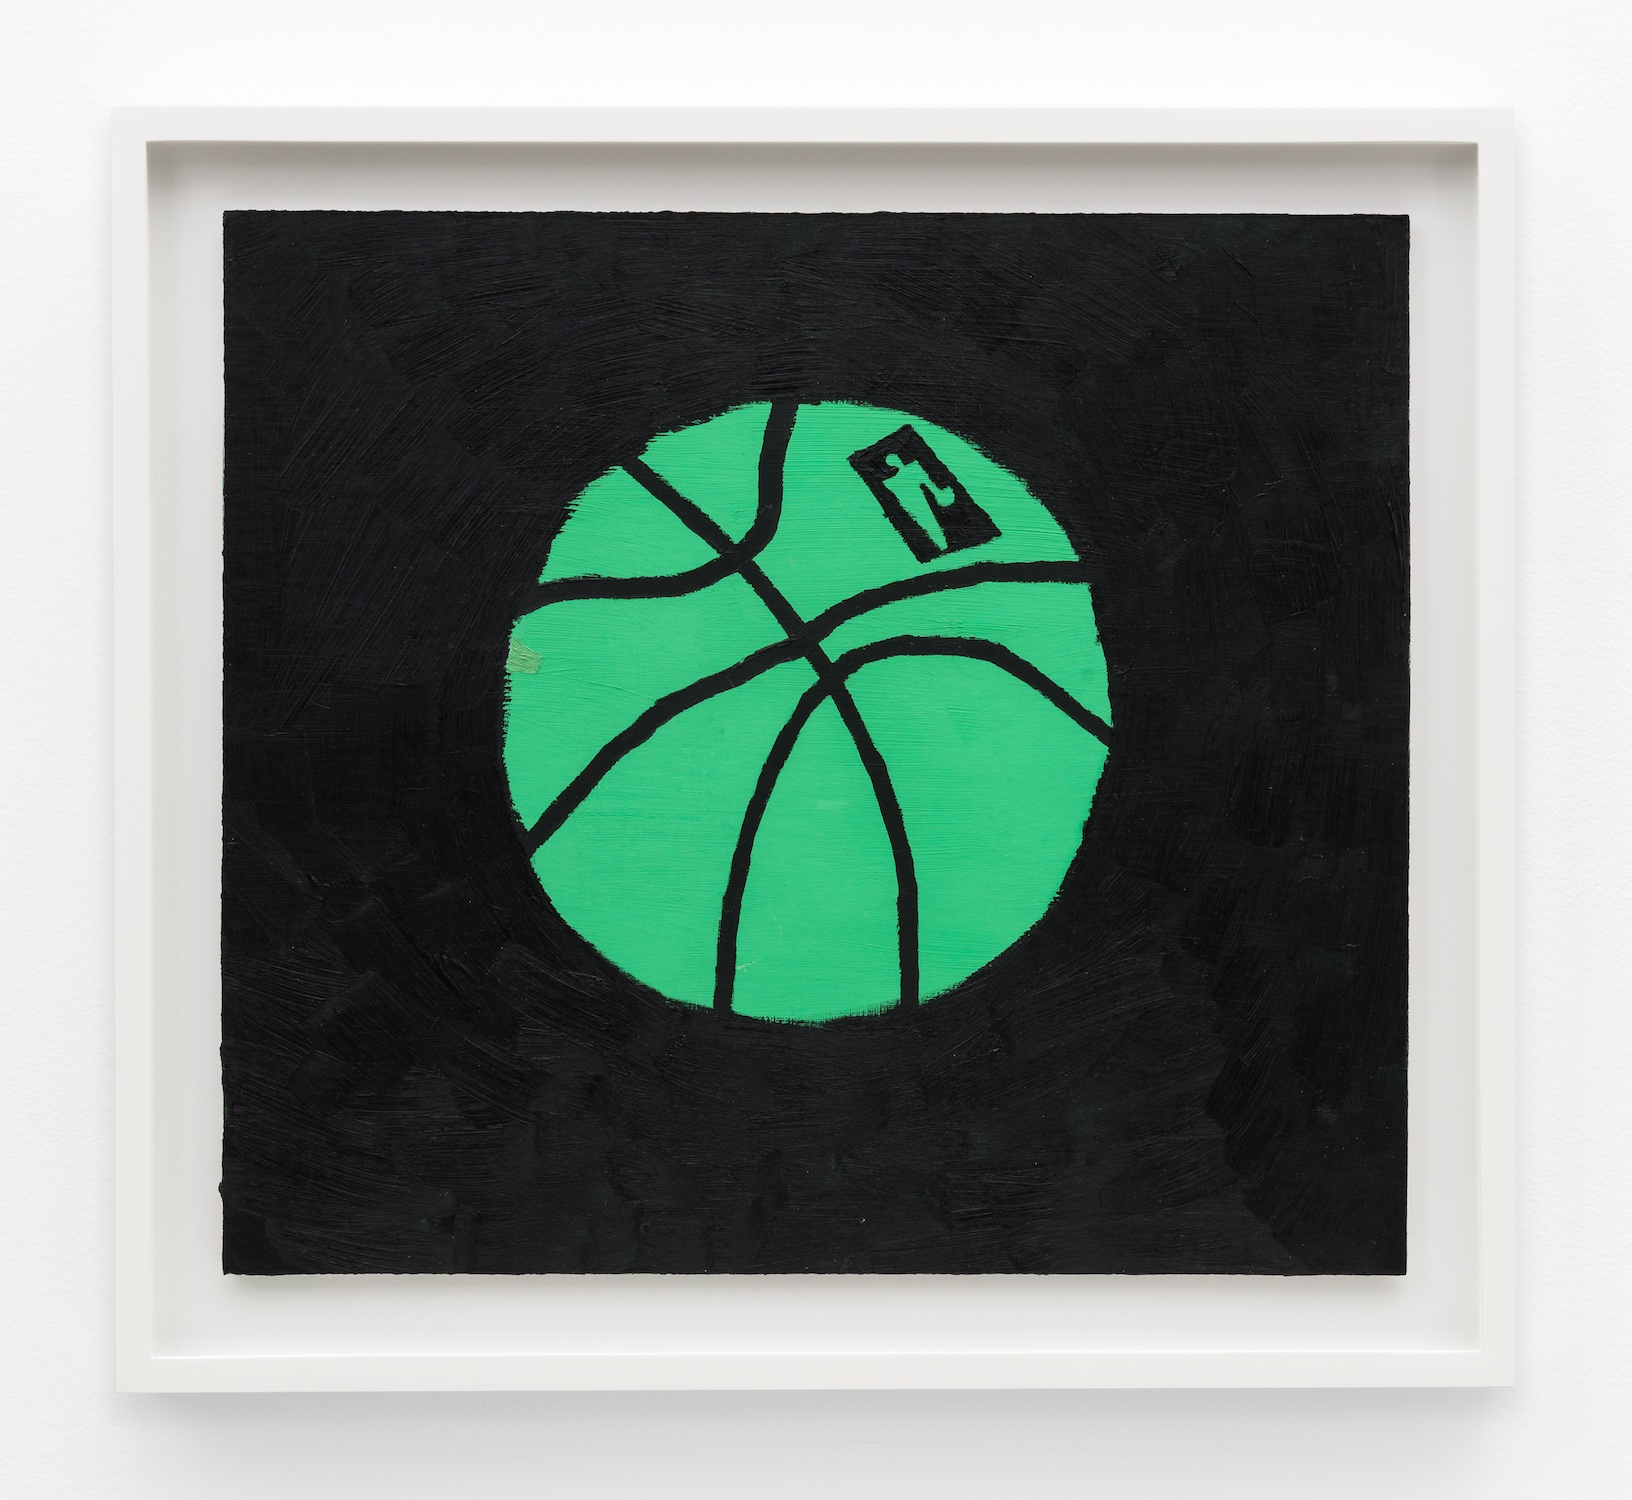 Jonas Wood  Green Ball  2014 Oil and acrylic on cardboard 14 ⅝h x 16 ¼w in JW190